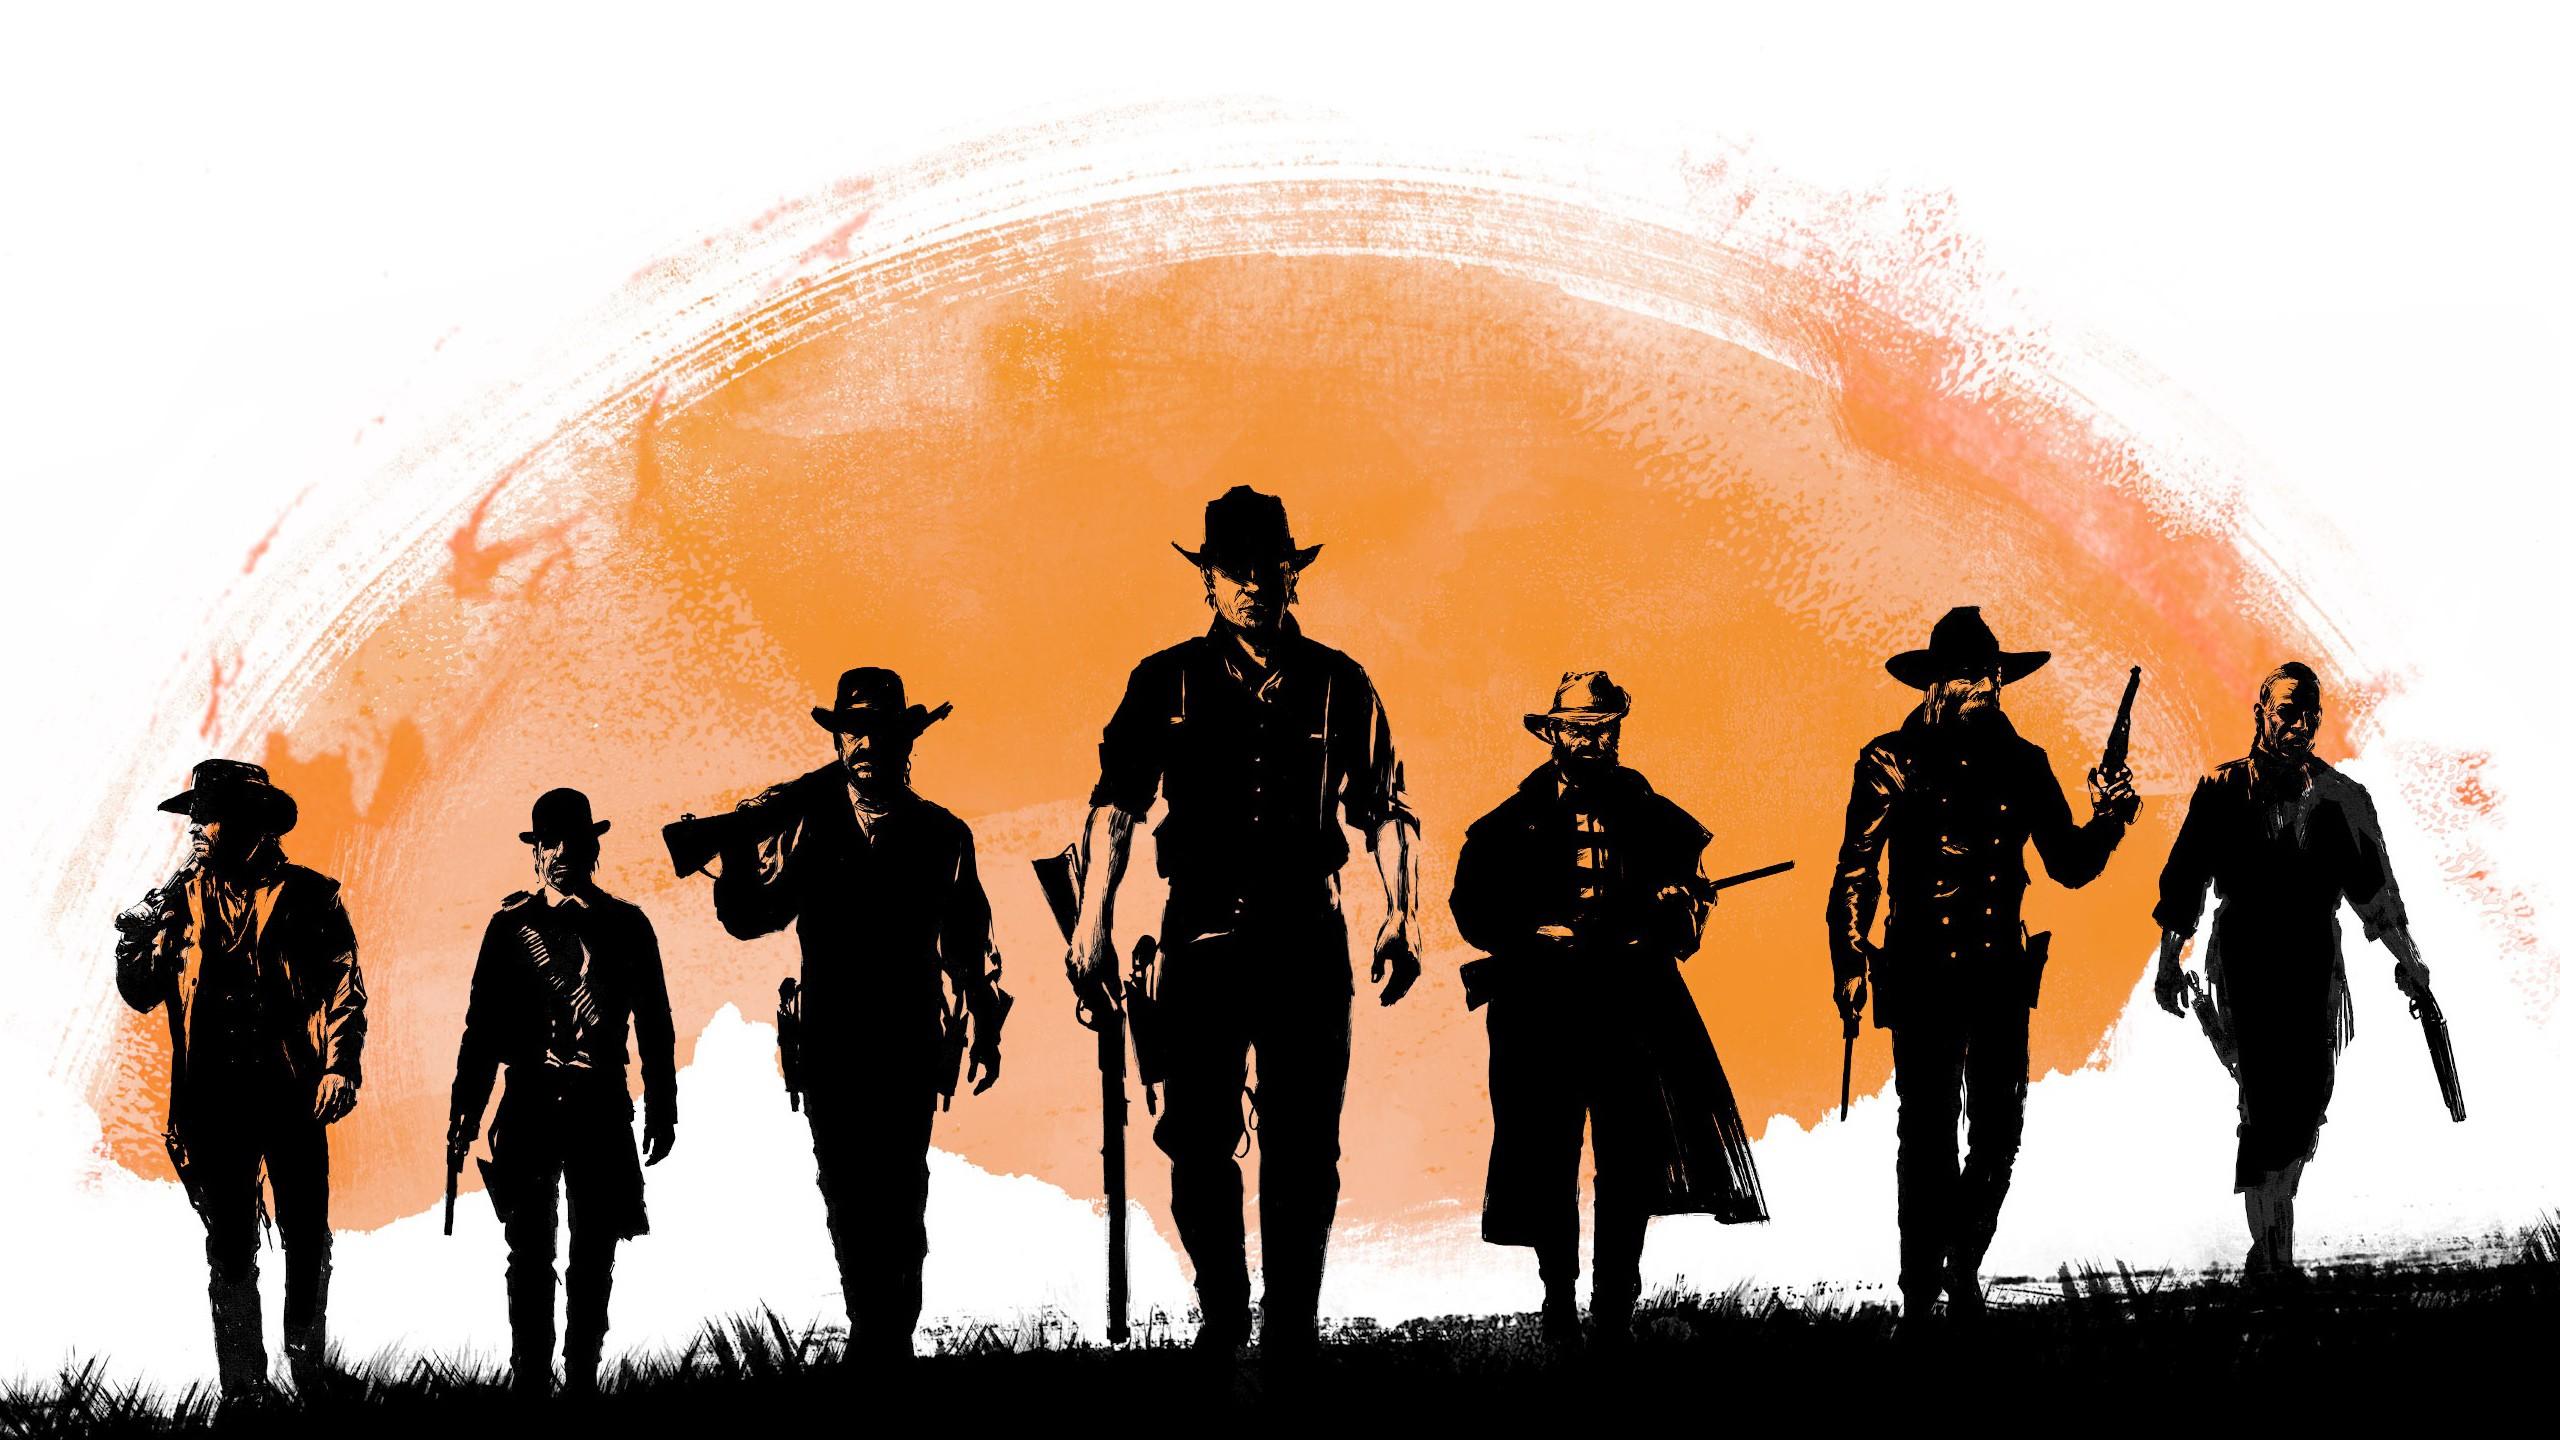 Red Dead Redemption Wallpaper Hd Red Dead Redemption 2 Wallpapers Hd Wallpapers Id 20063